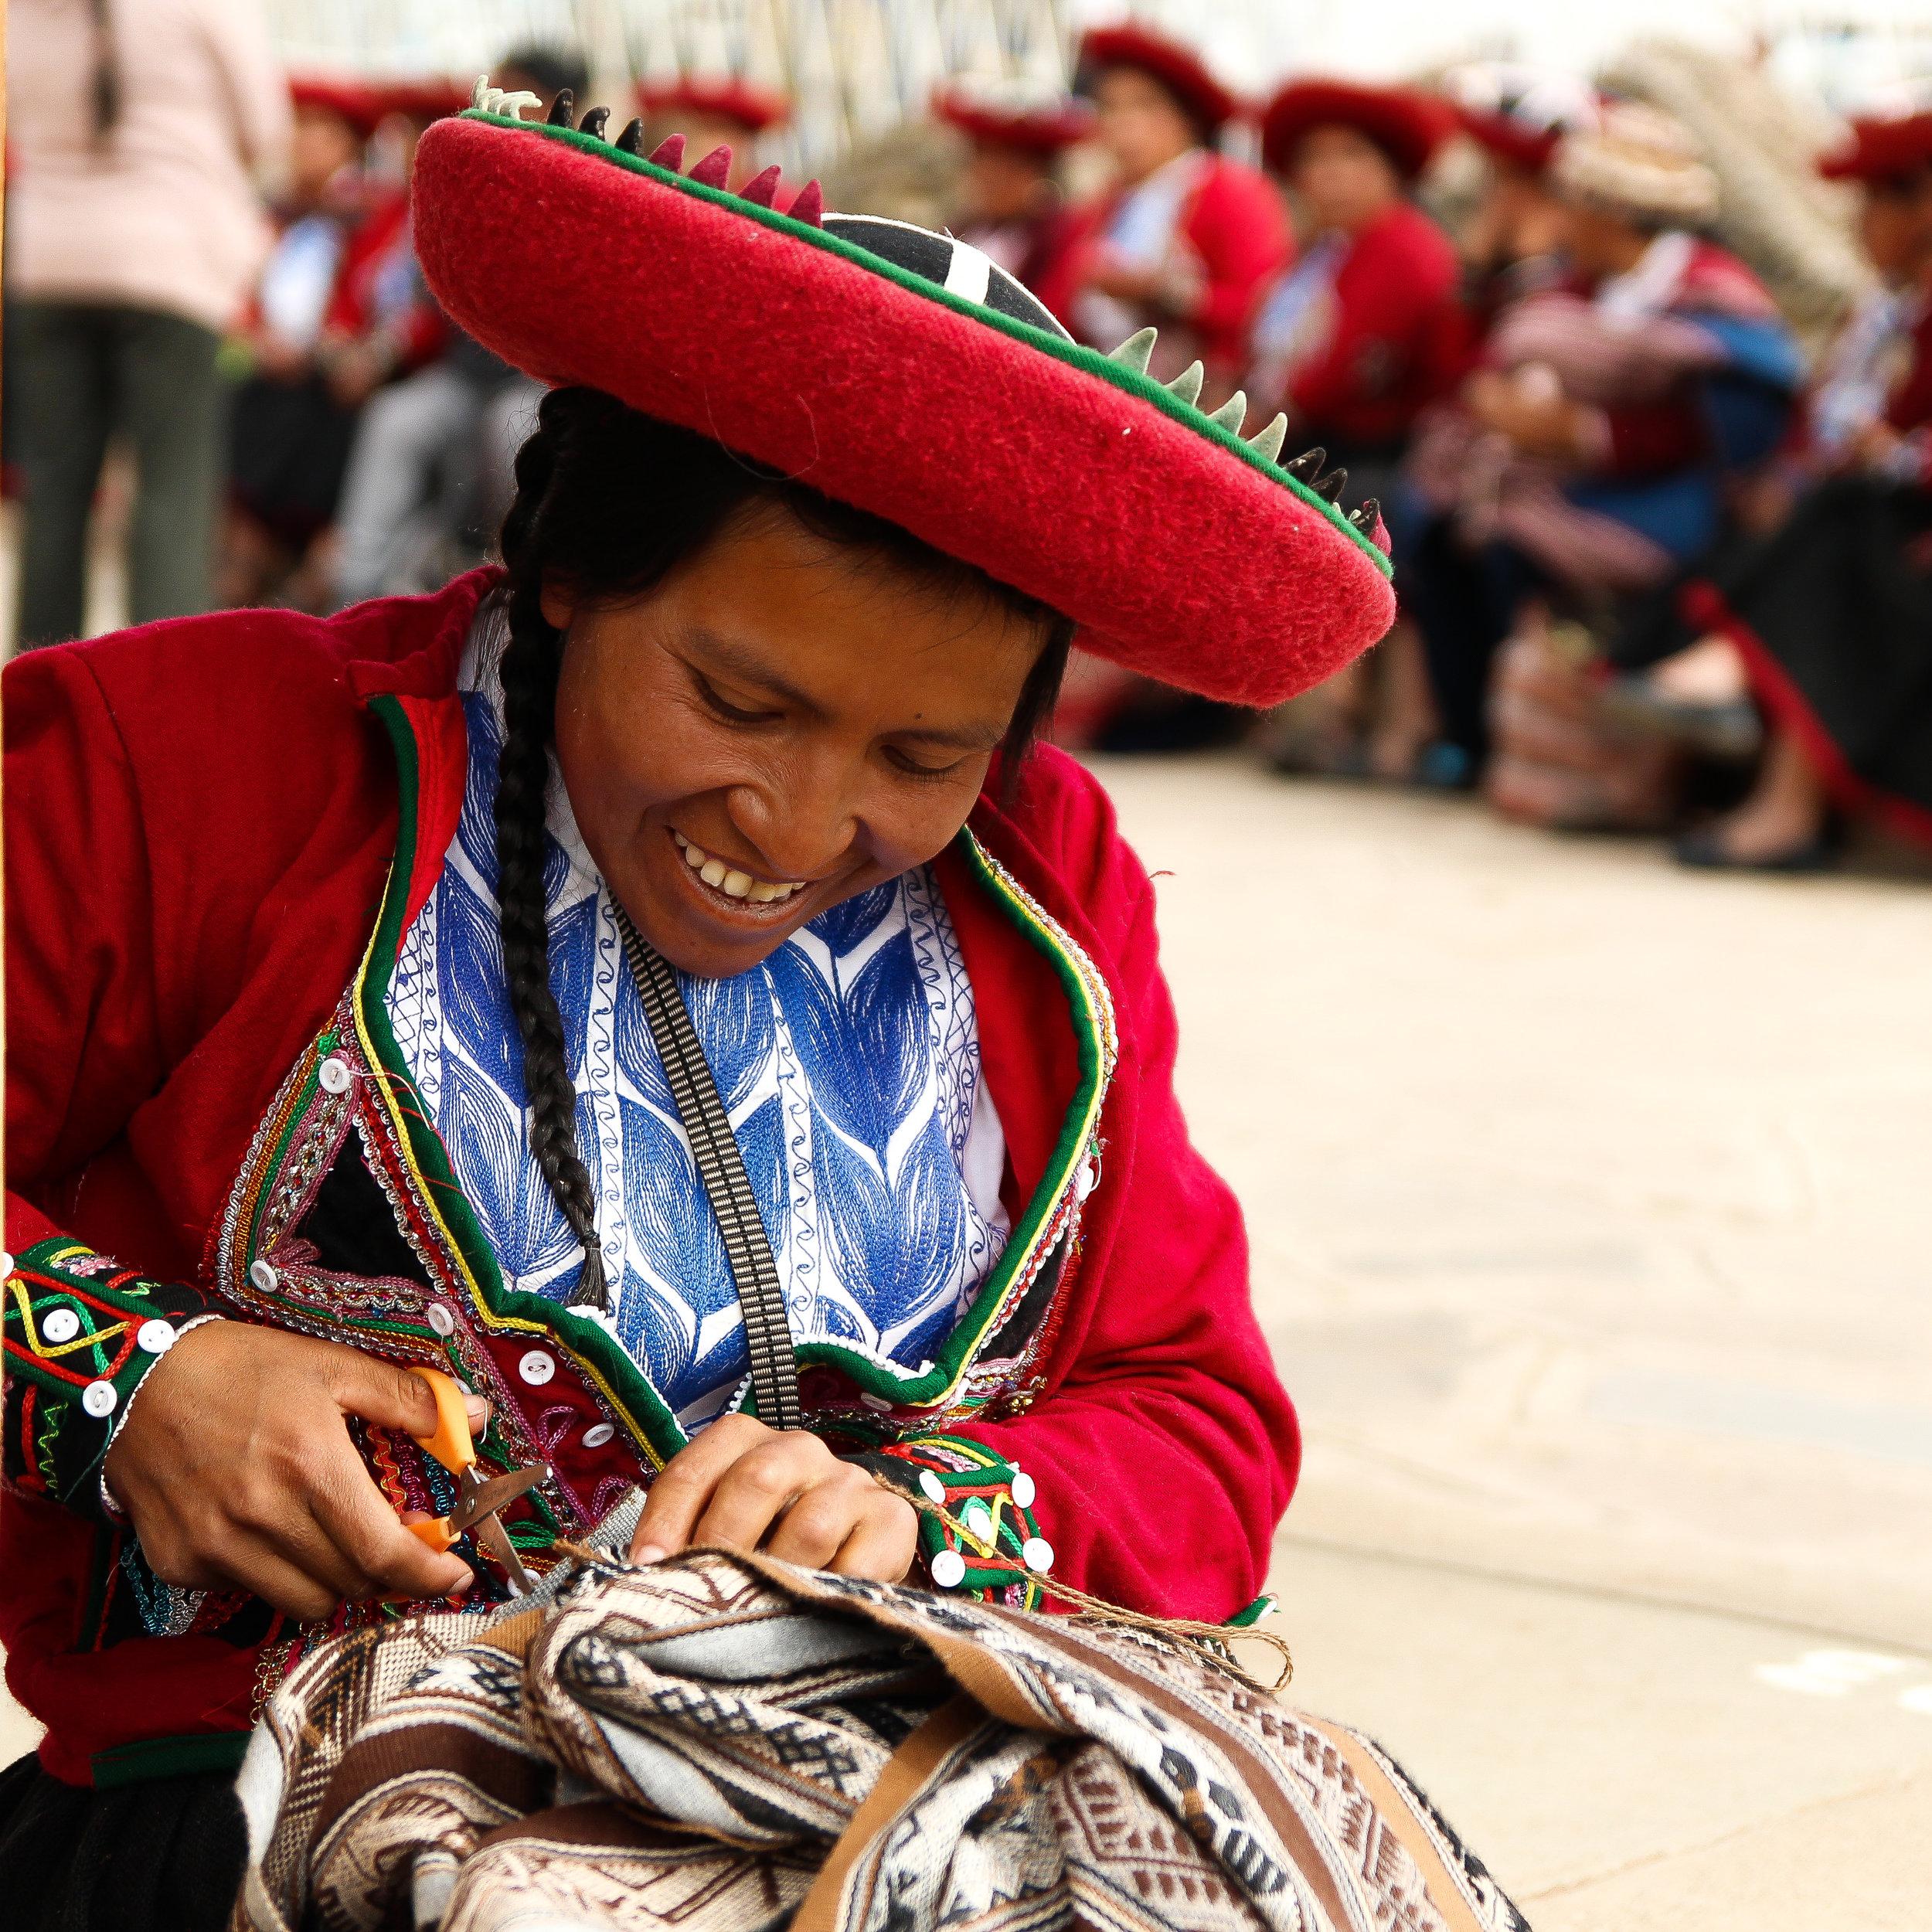 Chinchero, Peru, 2018- Lili Maria a Quechuan woman and textile artist